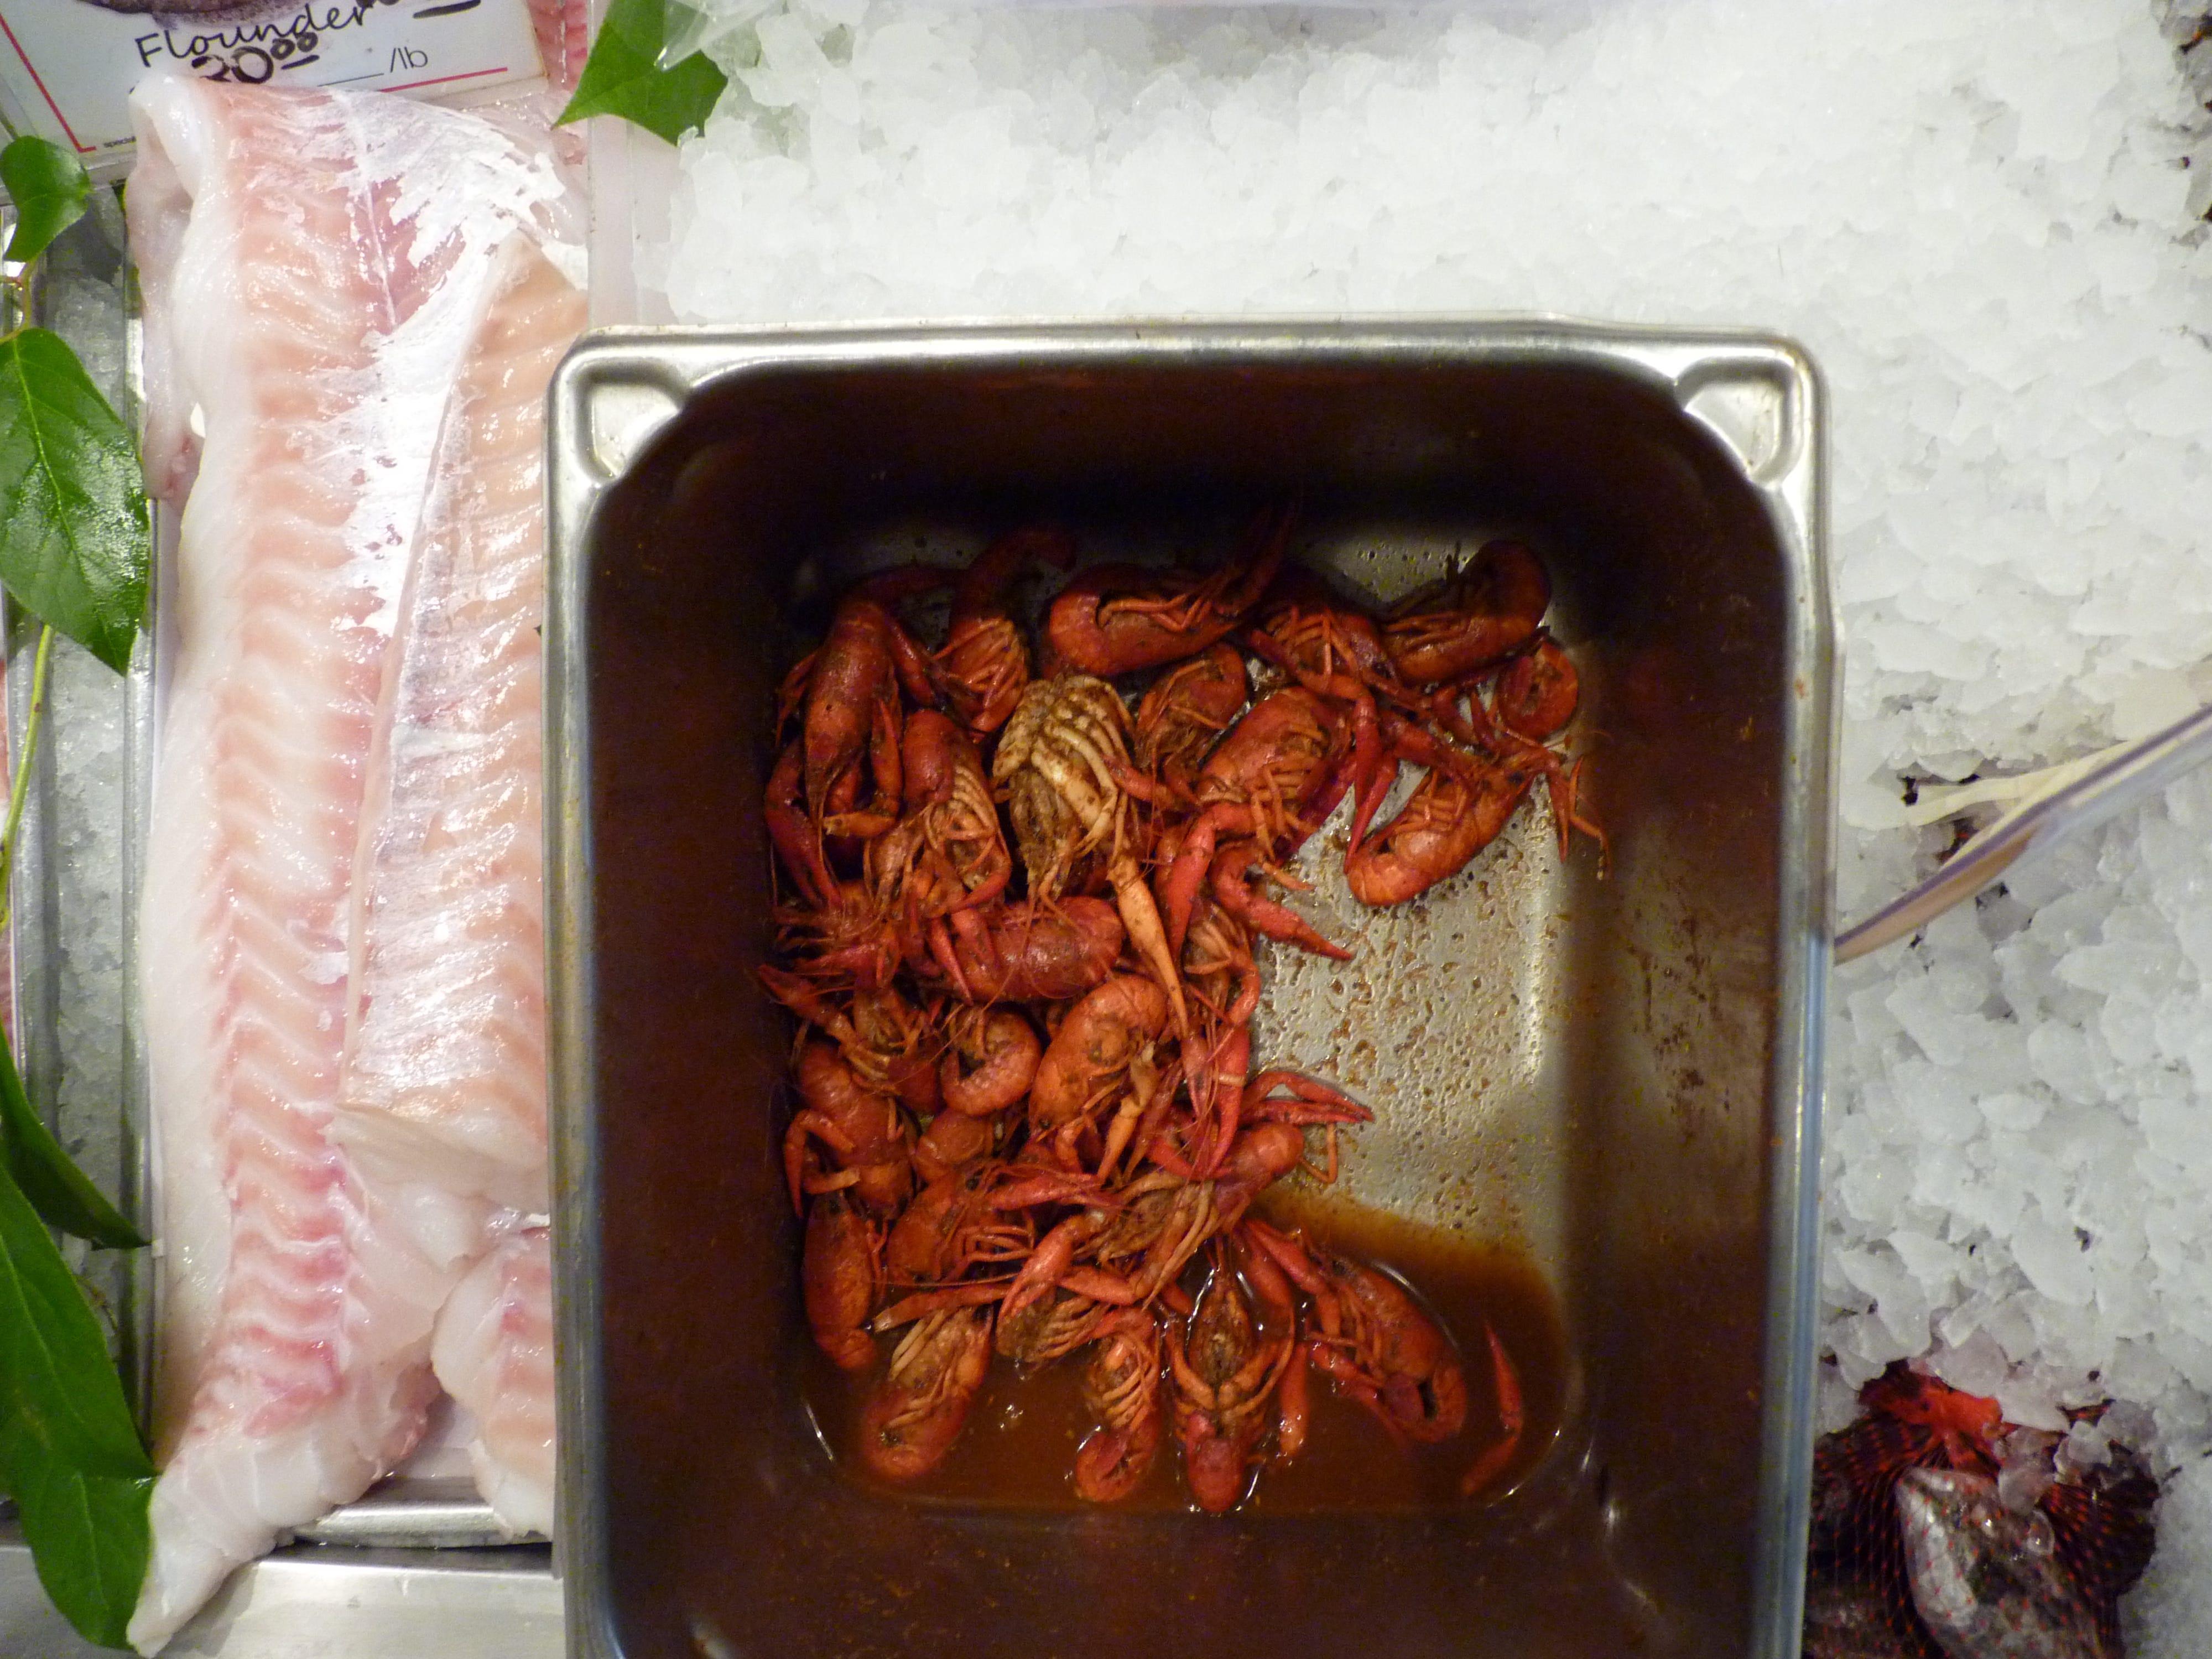 Fresh crawfish at Metropolitan Seafood & Gourmet in Lebanon.